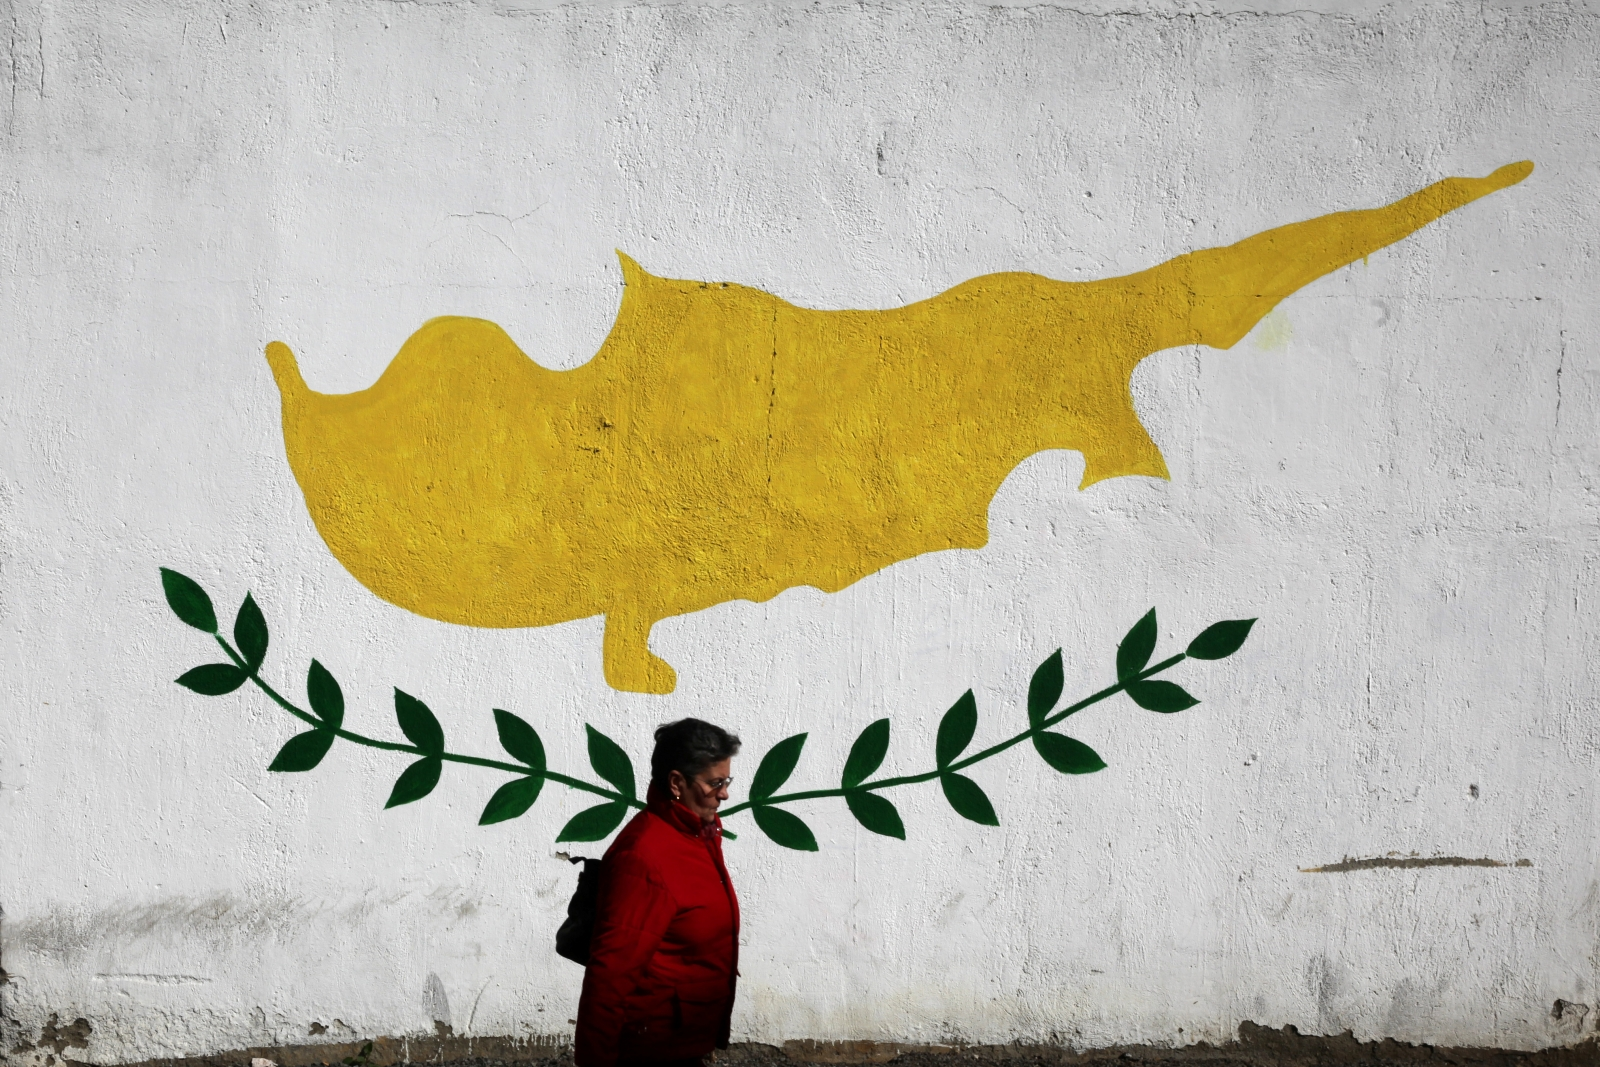 Cyprus Cypriot flag